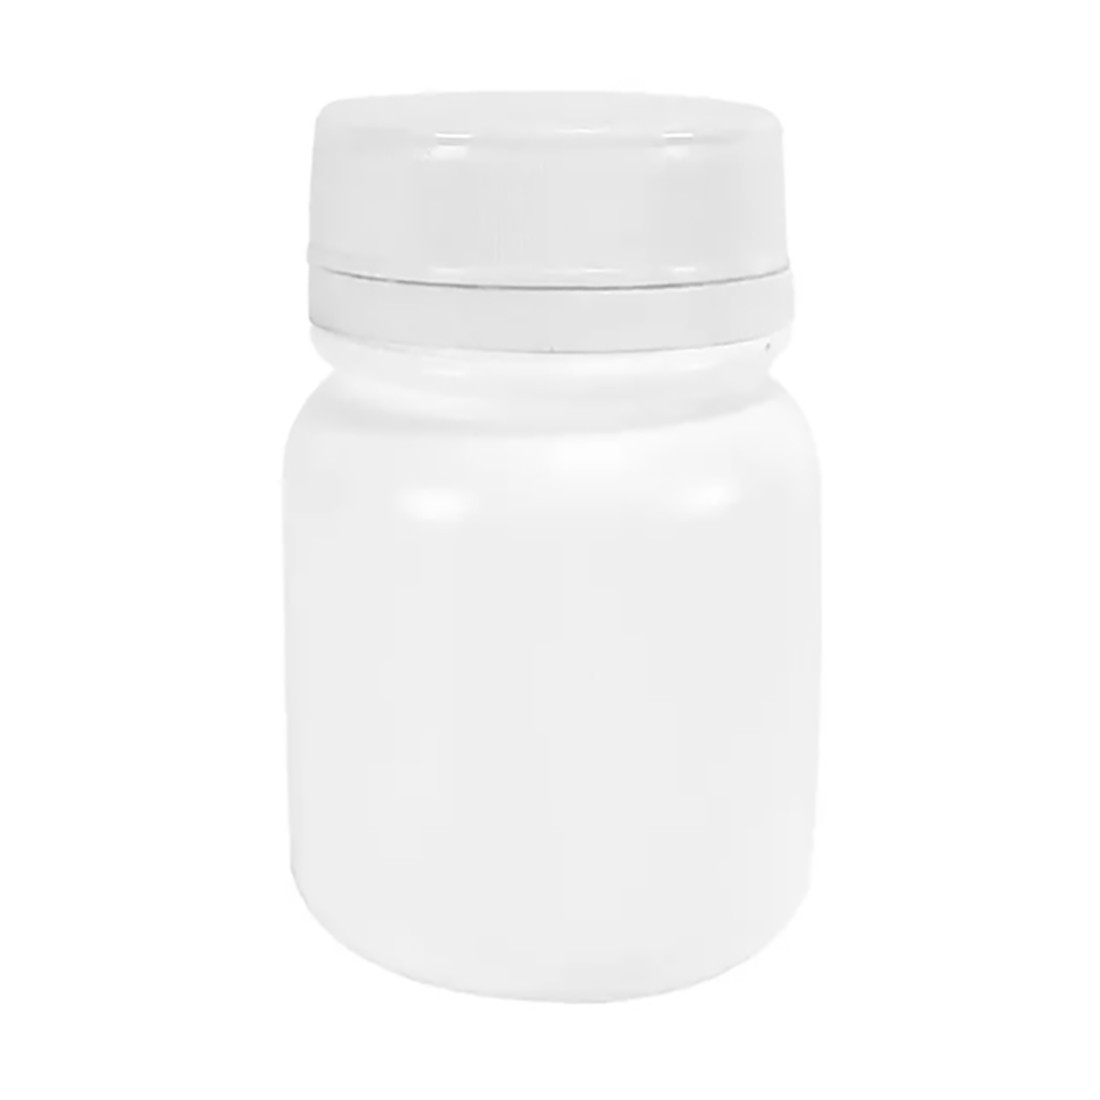 Pote Plástico para cápsula 90 ml Rosca Lacre kit com 100 unid